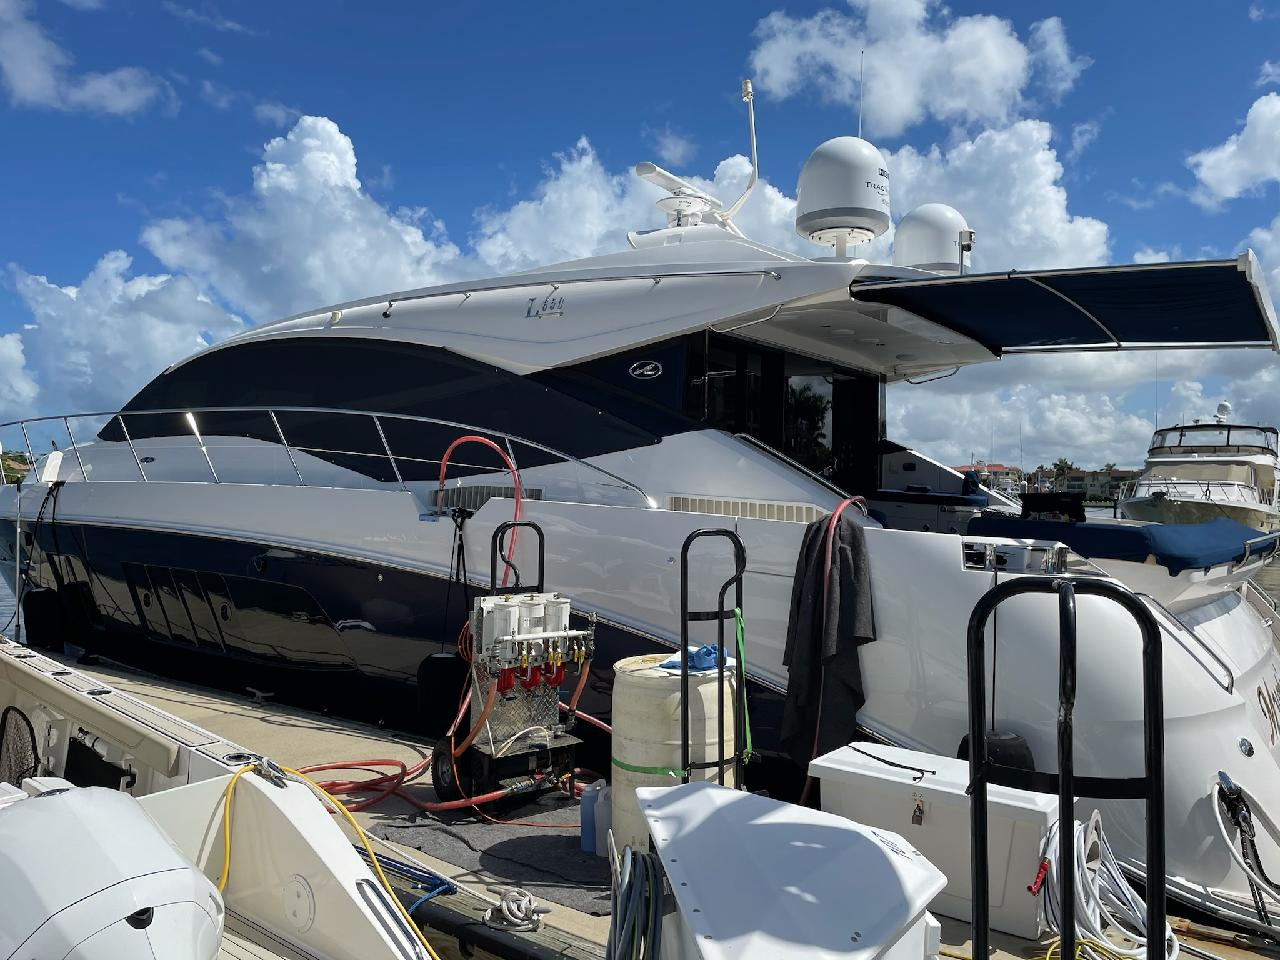 fuel polishing in a boat in Charleston South Carolina